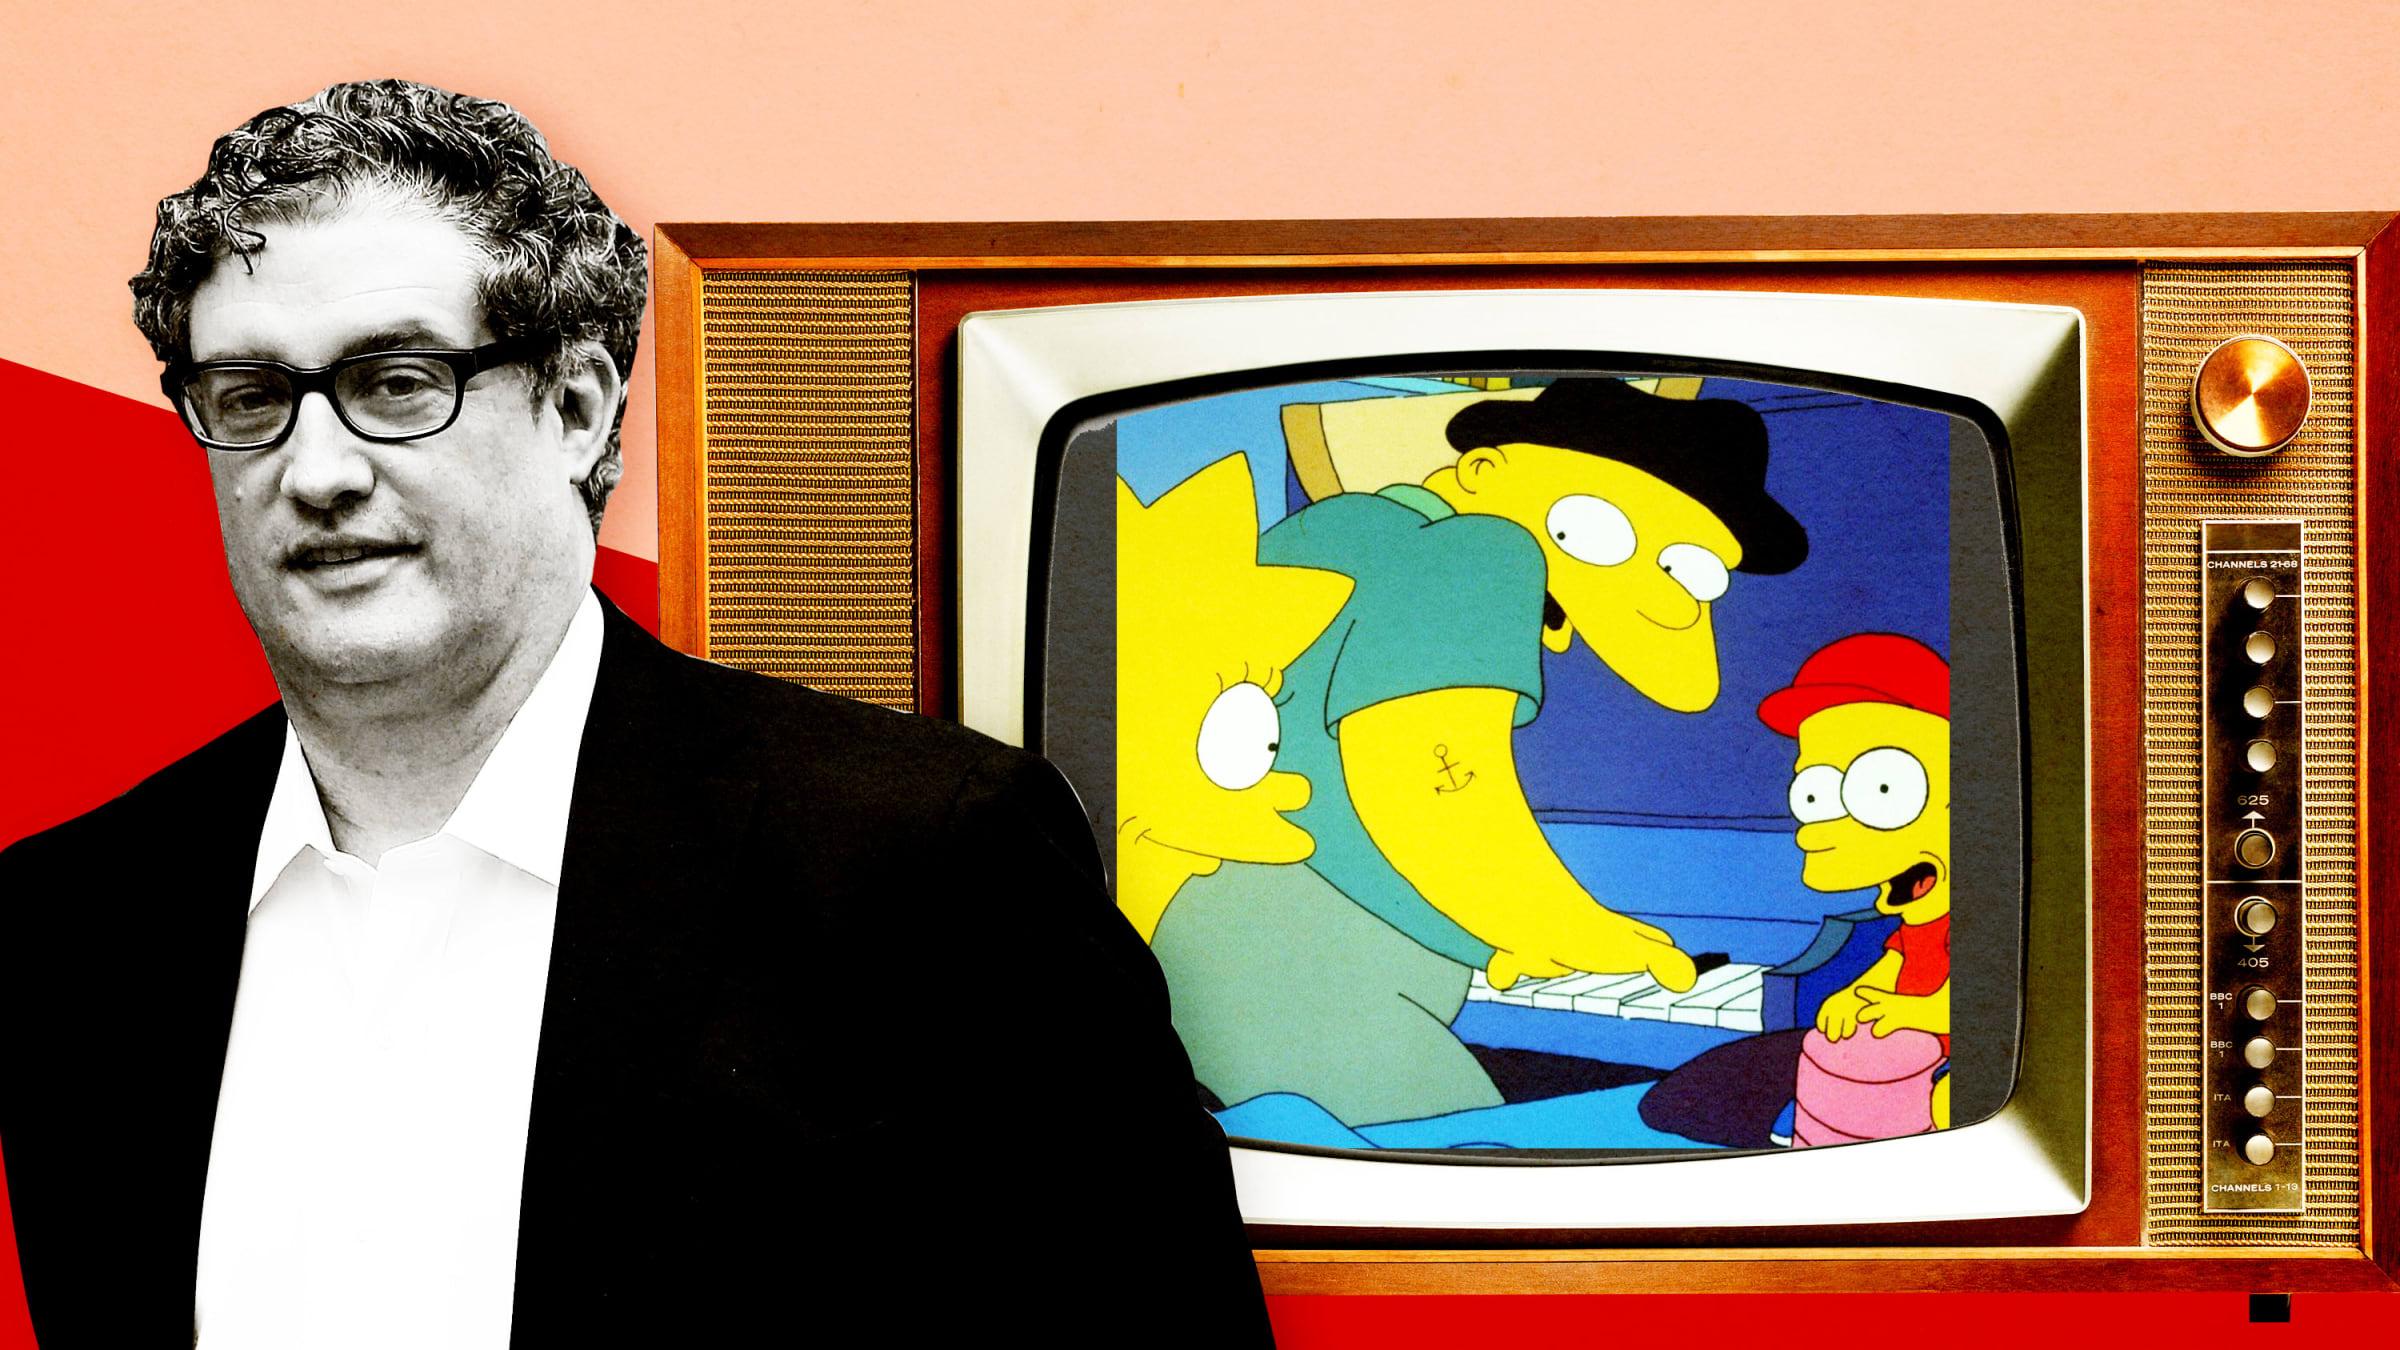 'The Simpsons' Boss Al Jean: Michael Jackson Used the Show to 'Groom Boys'